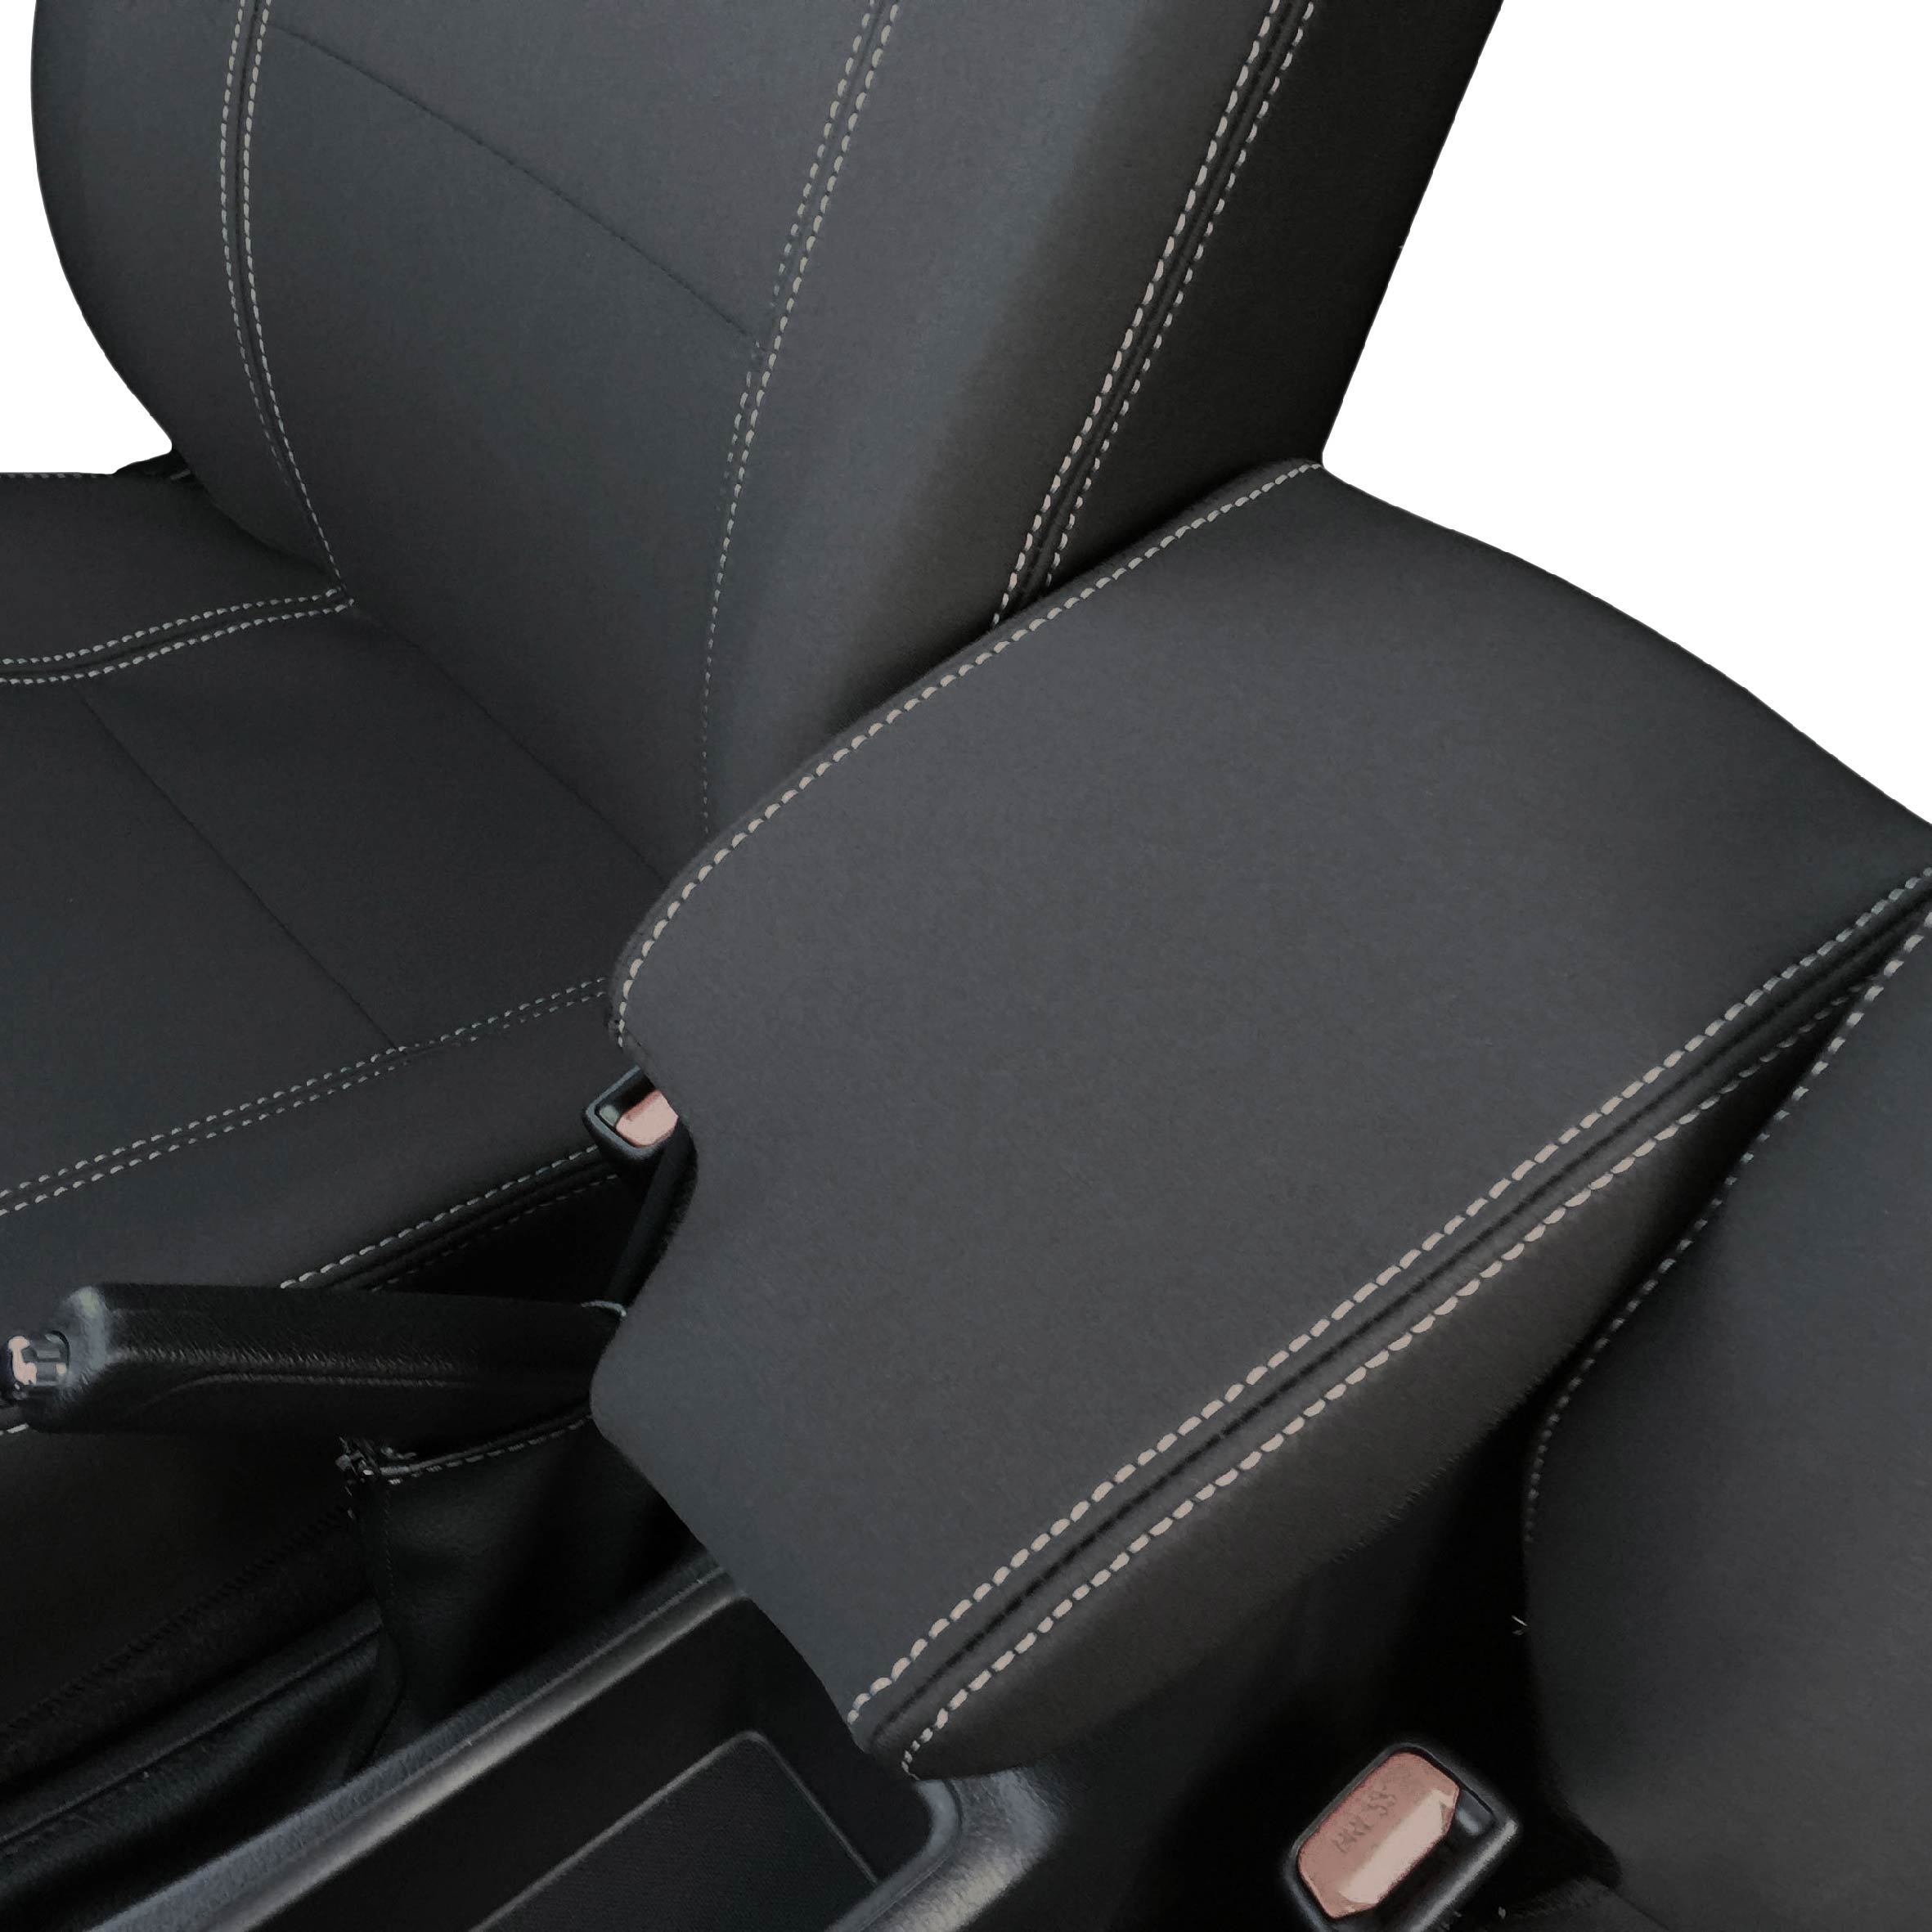 CONSOLE LID COVER Mitsubishi Pajero 2000-Now 100/% WATERPROOF PREMIUM NEOPRENE